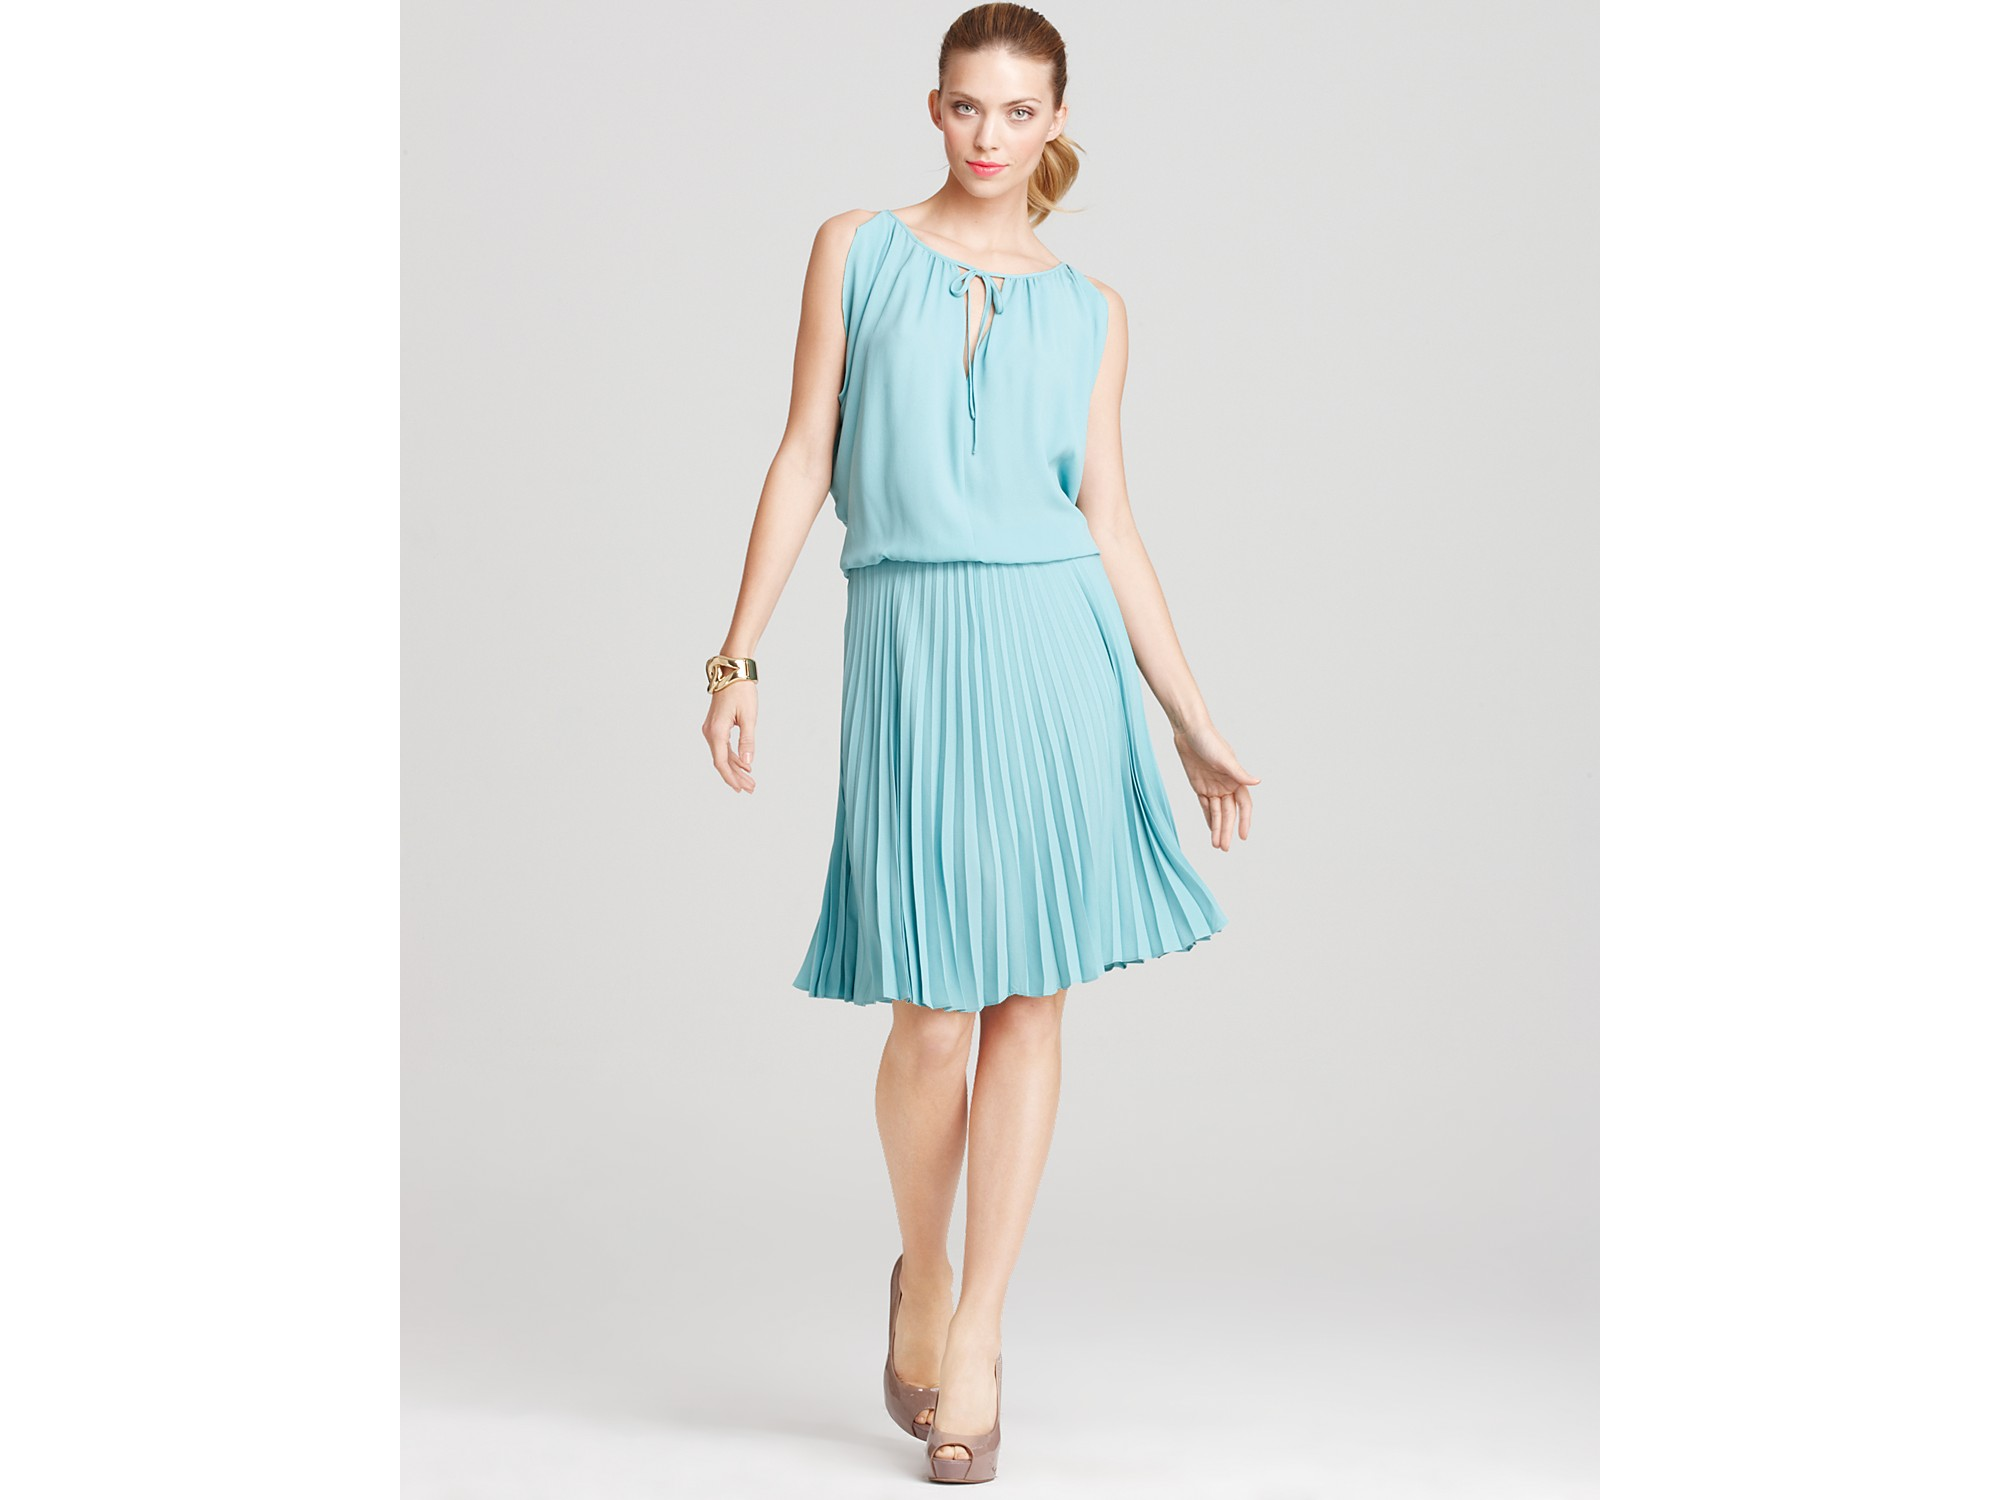 Bcbg baby blue dress - Best Dressed